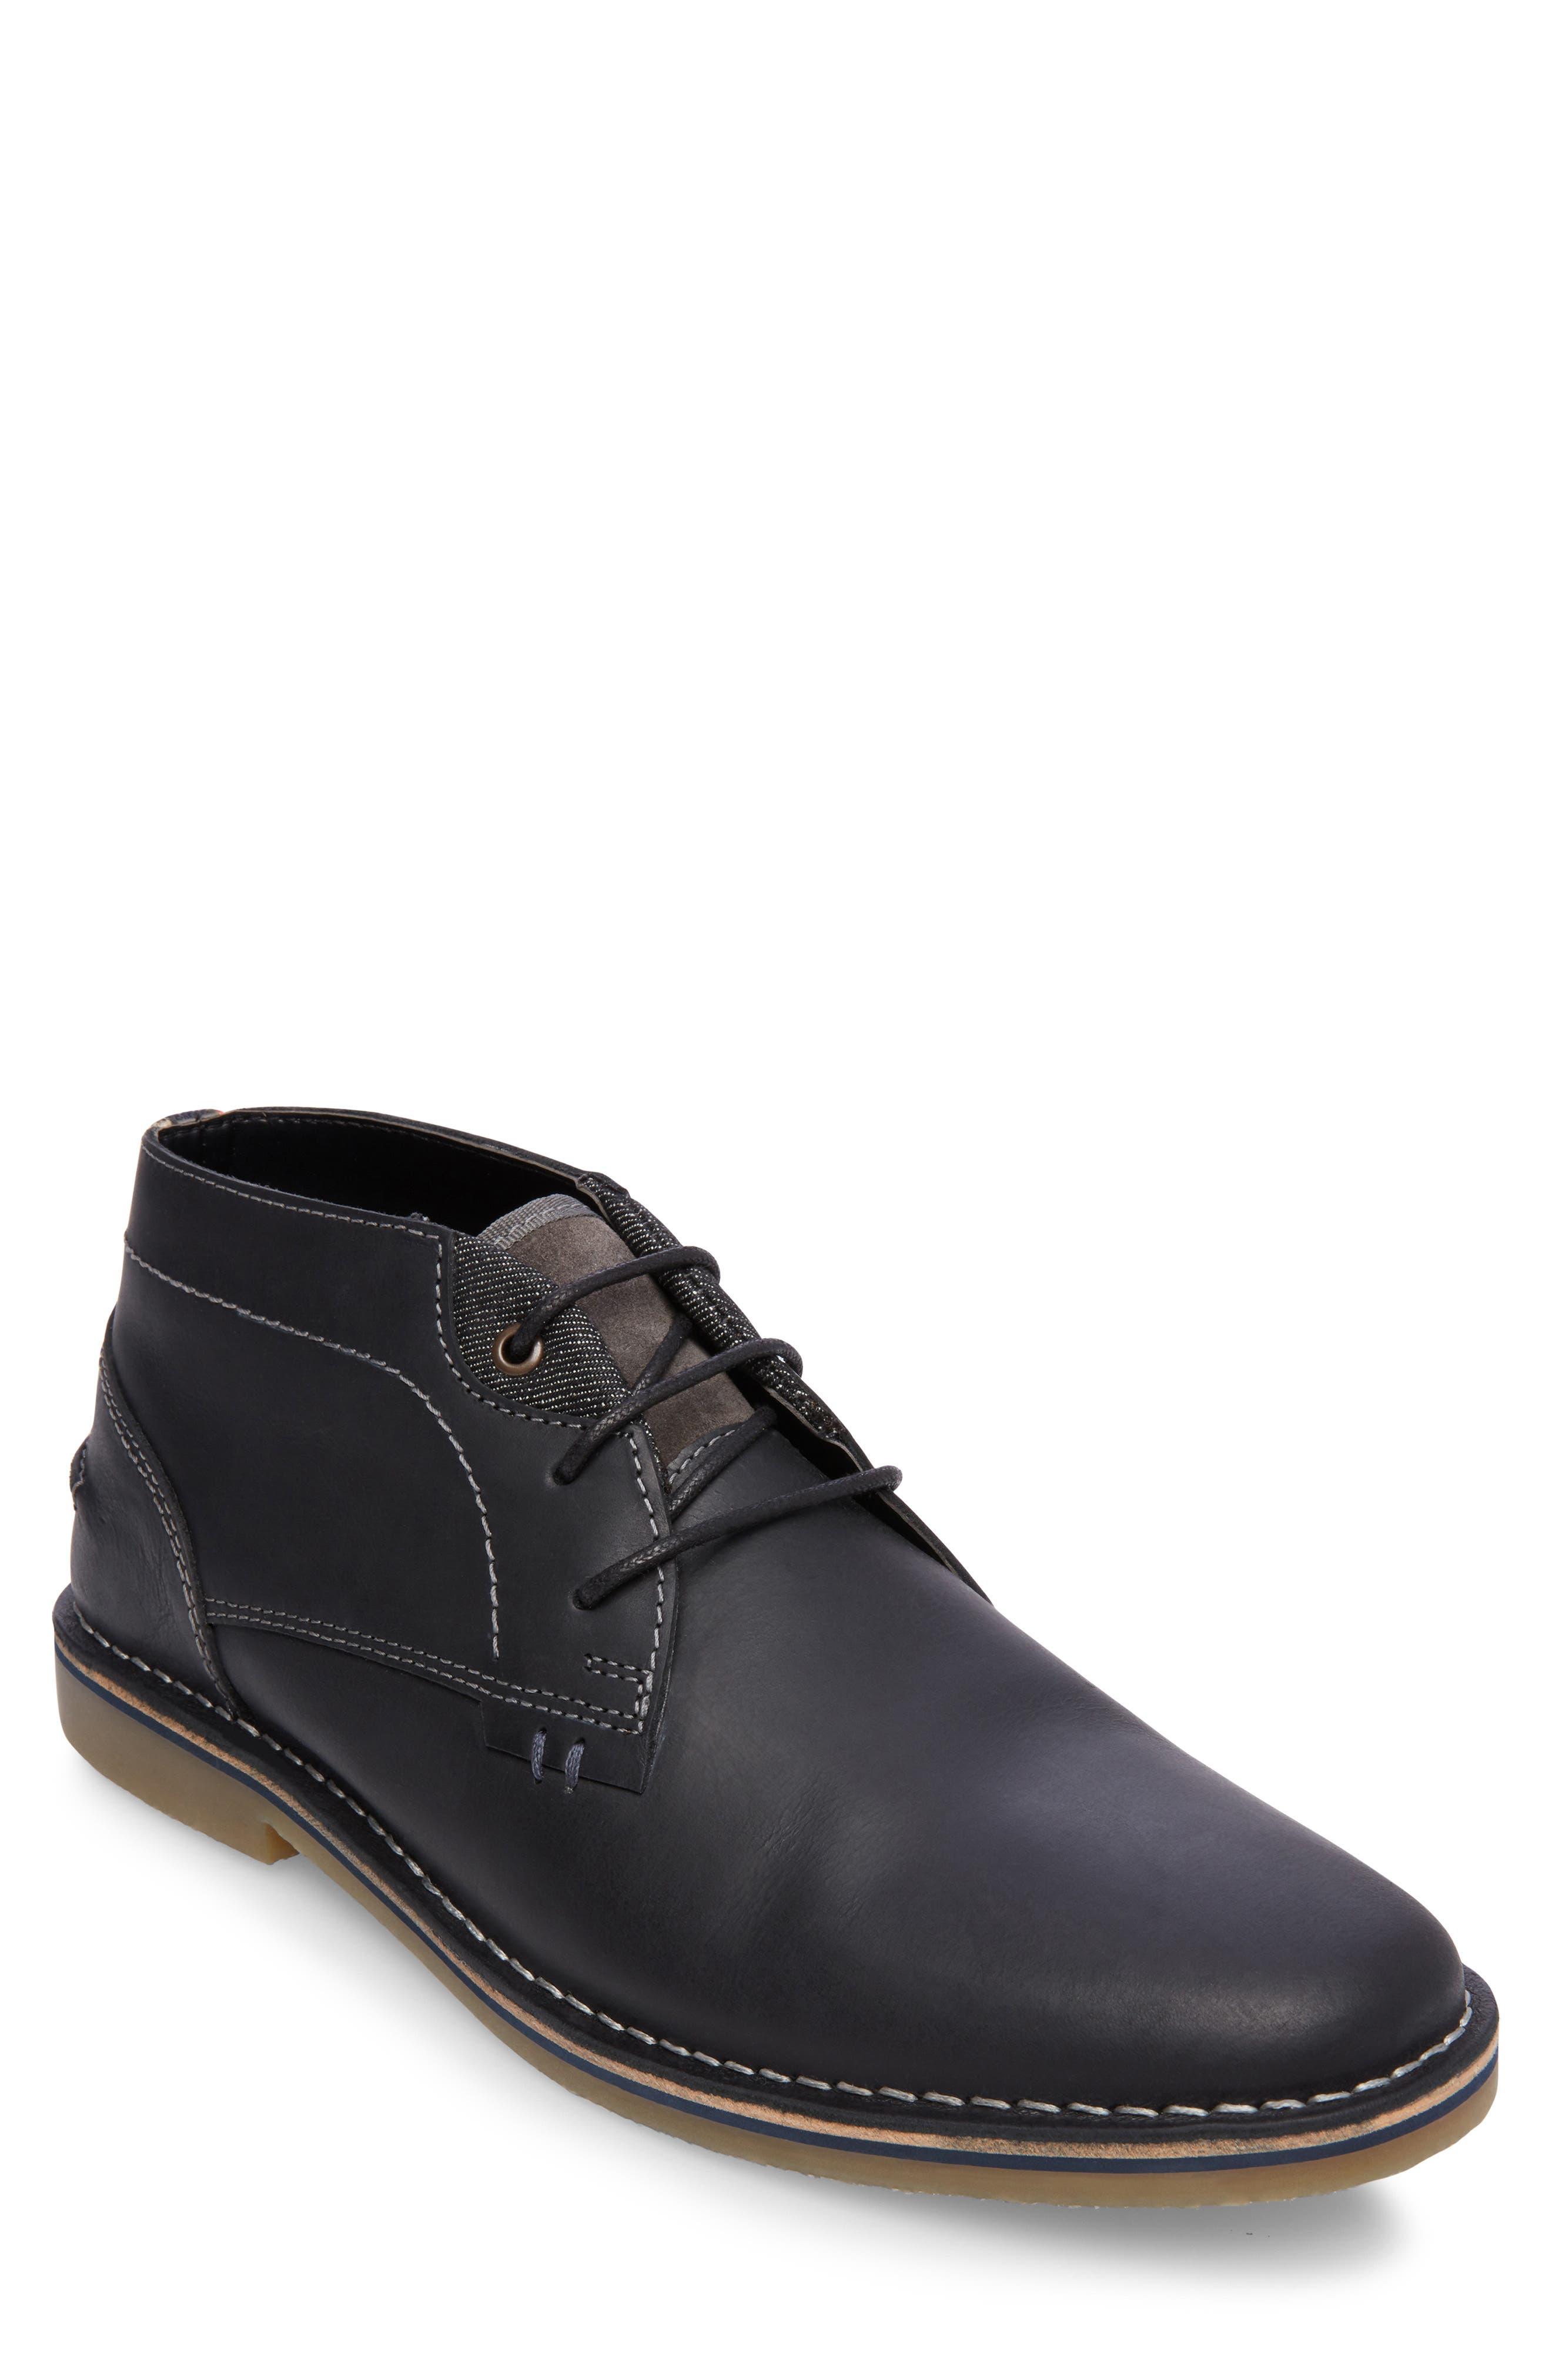 STEVE MADDEN Hinton Chukka Boot, Main, color, 001